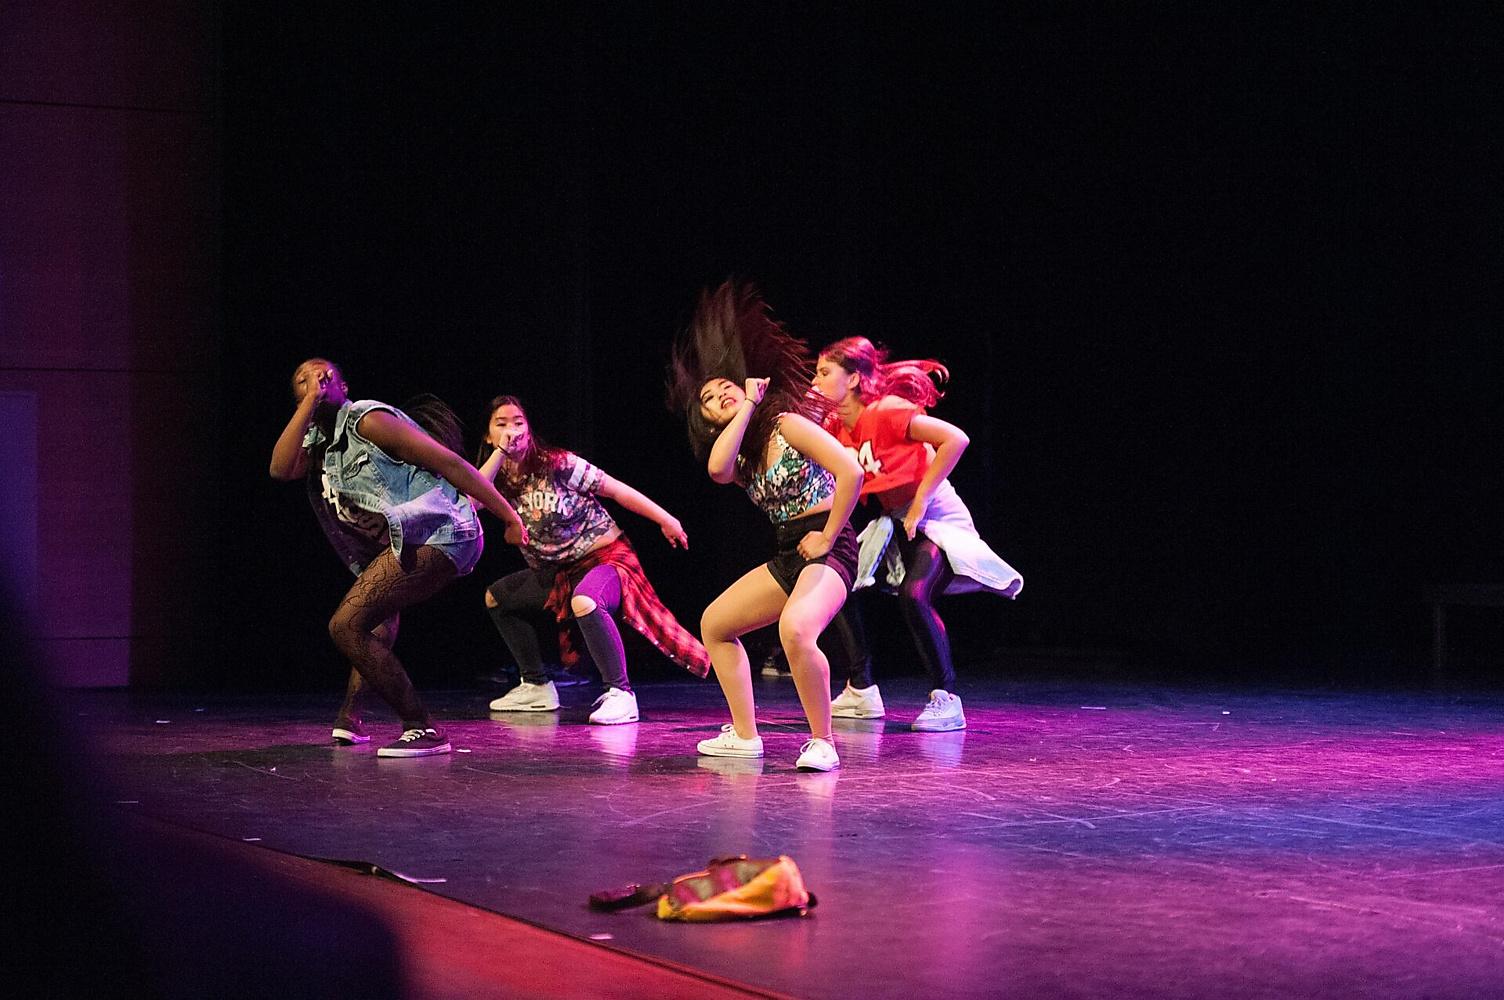 CKE Talentstroom muziek, dans of theater